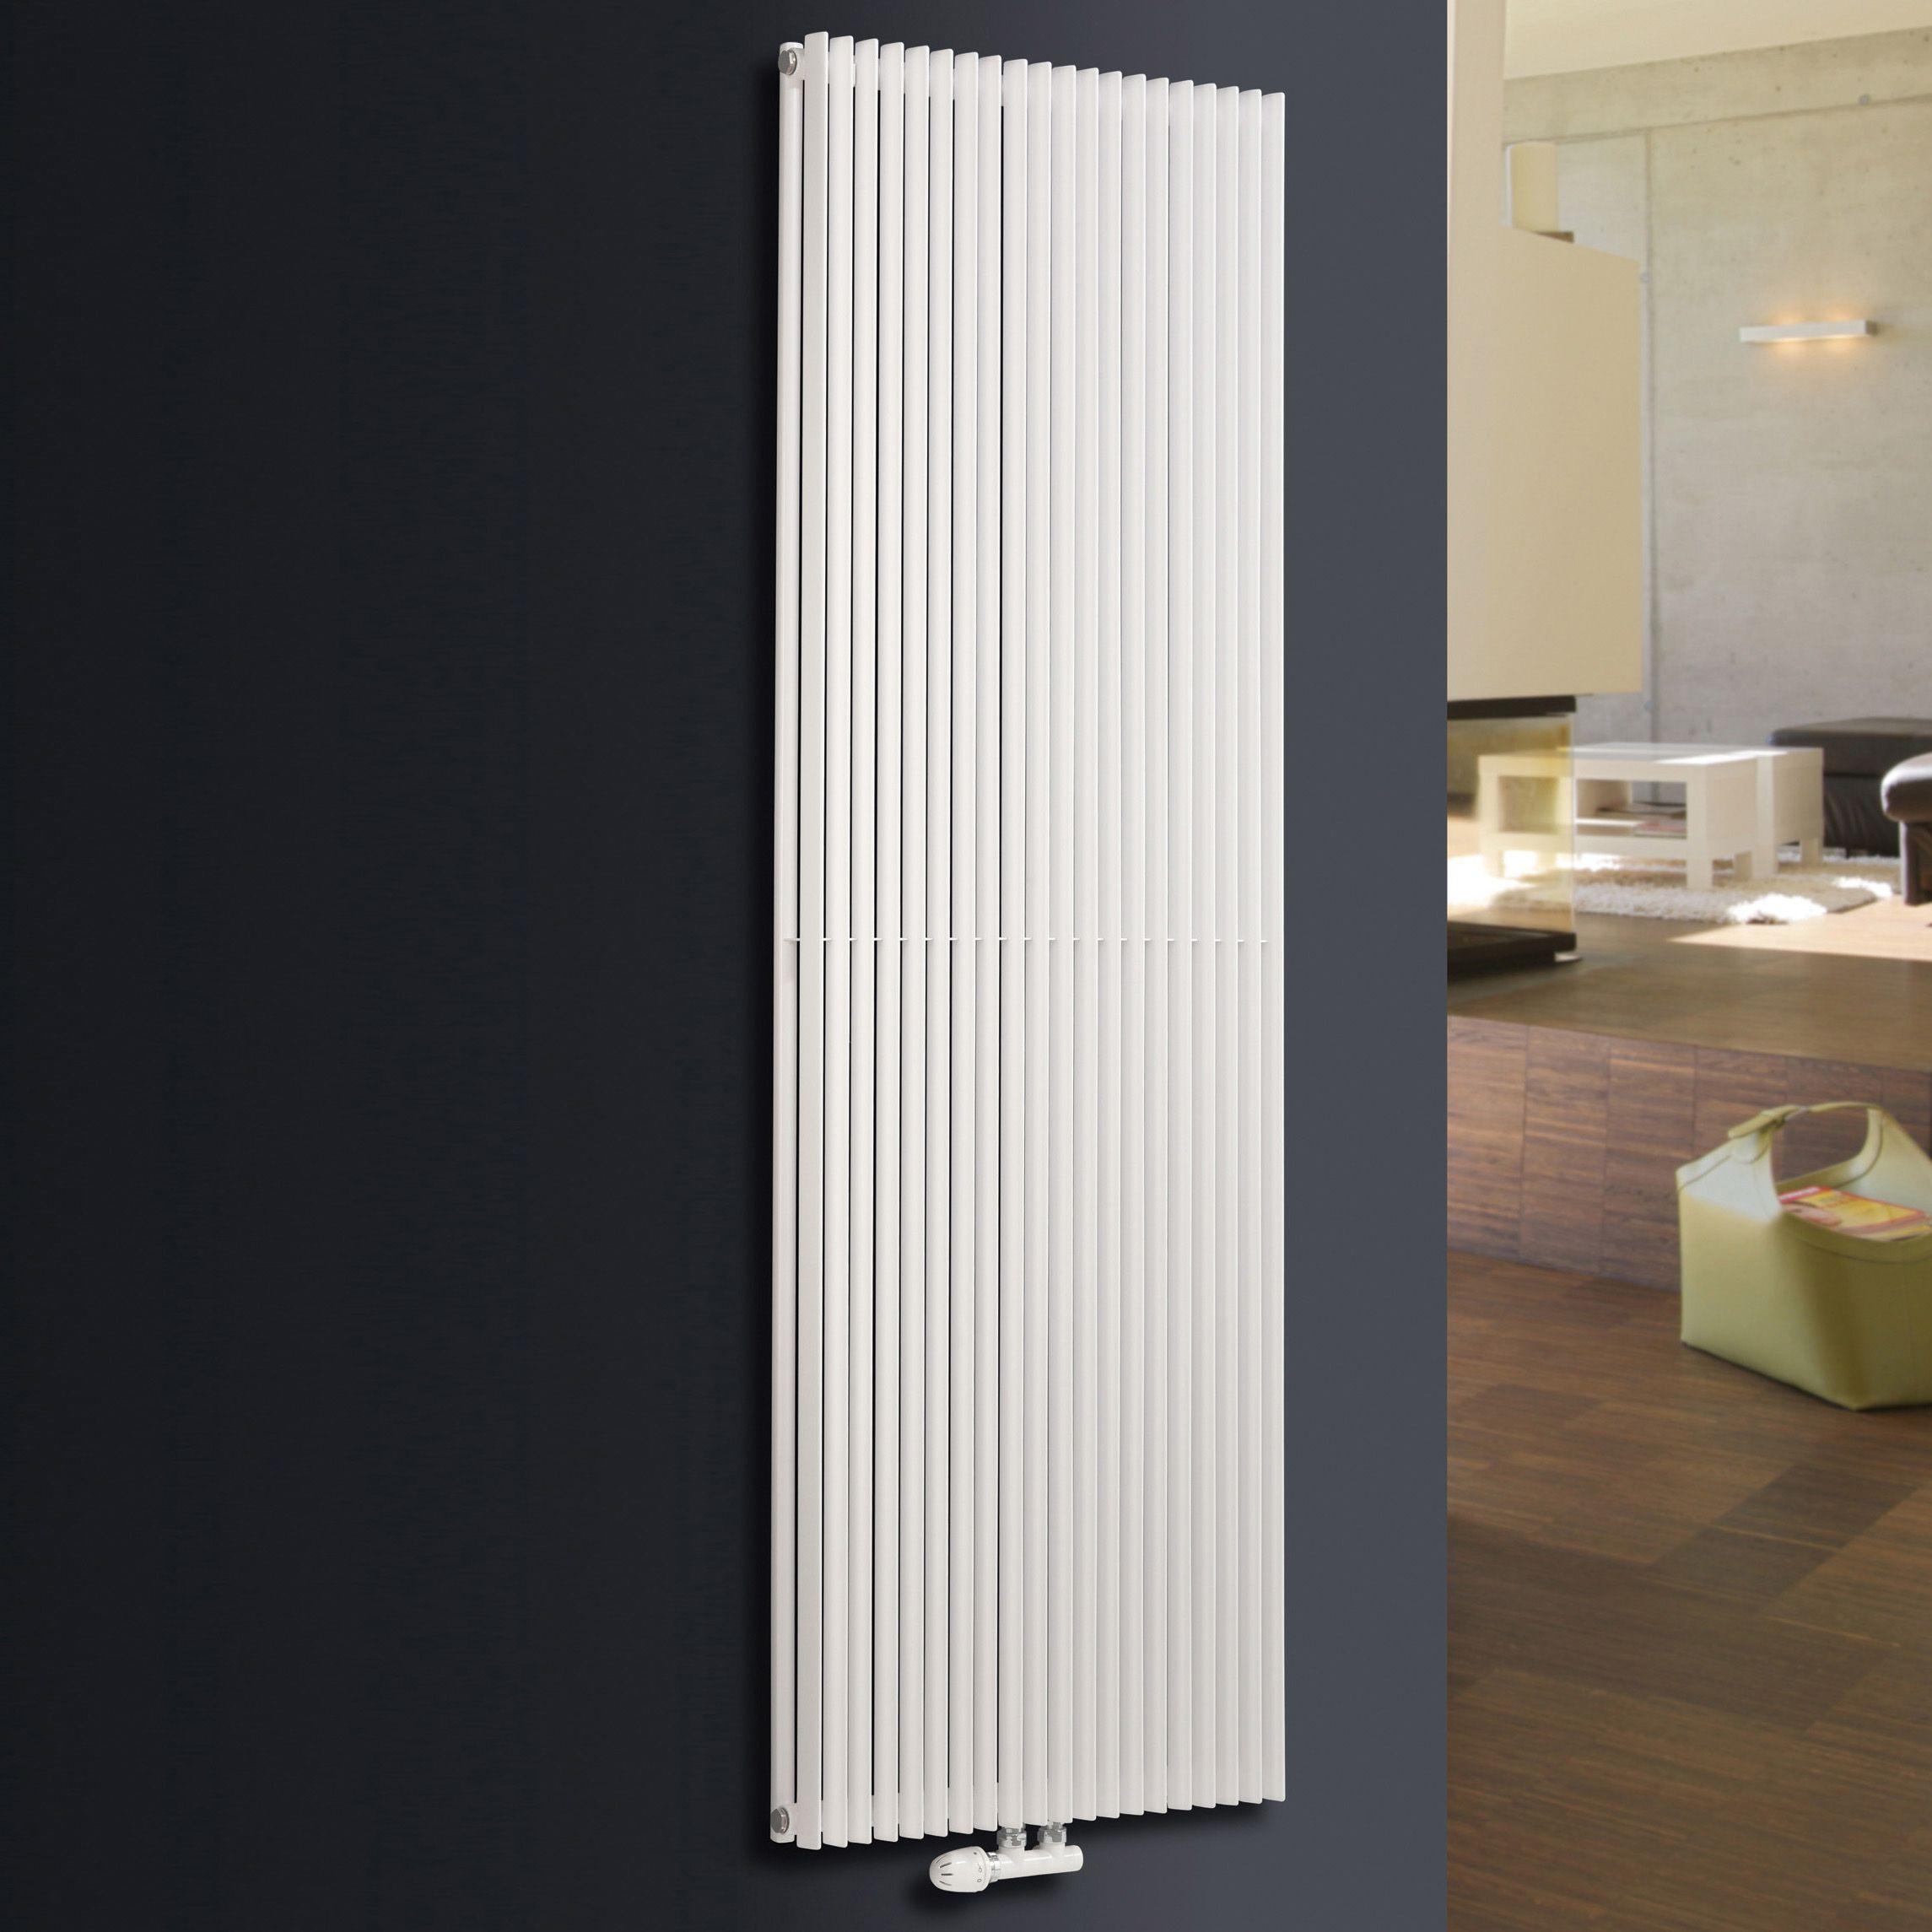 Ximax Triton Duplex Vertical Radiator White (H)1800 mm